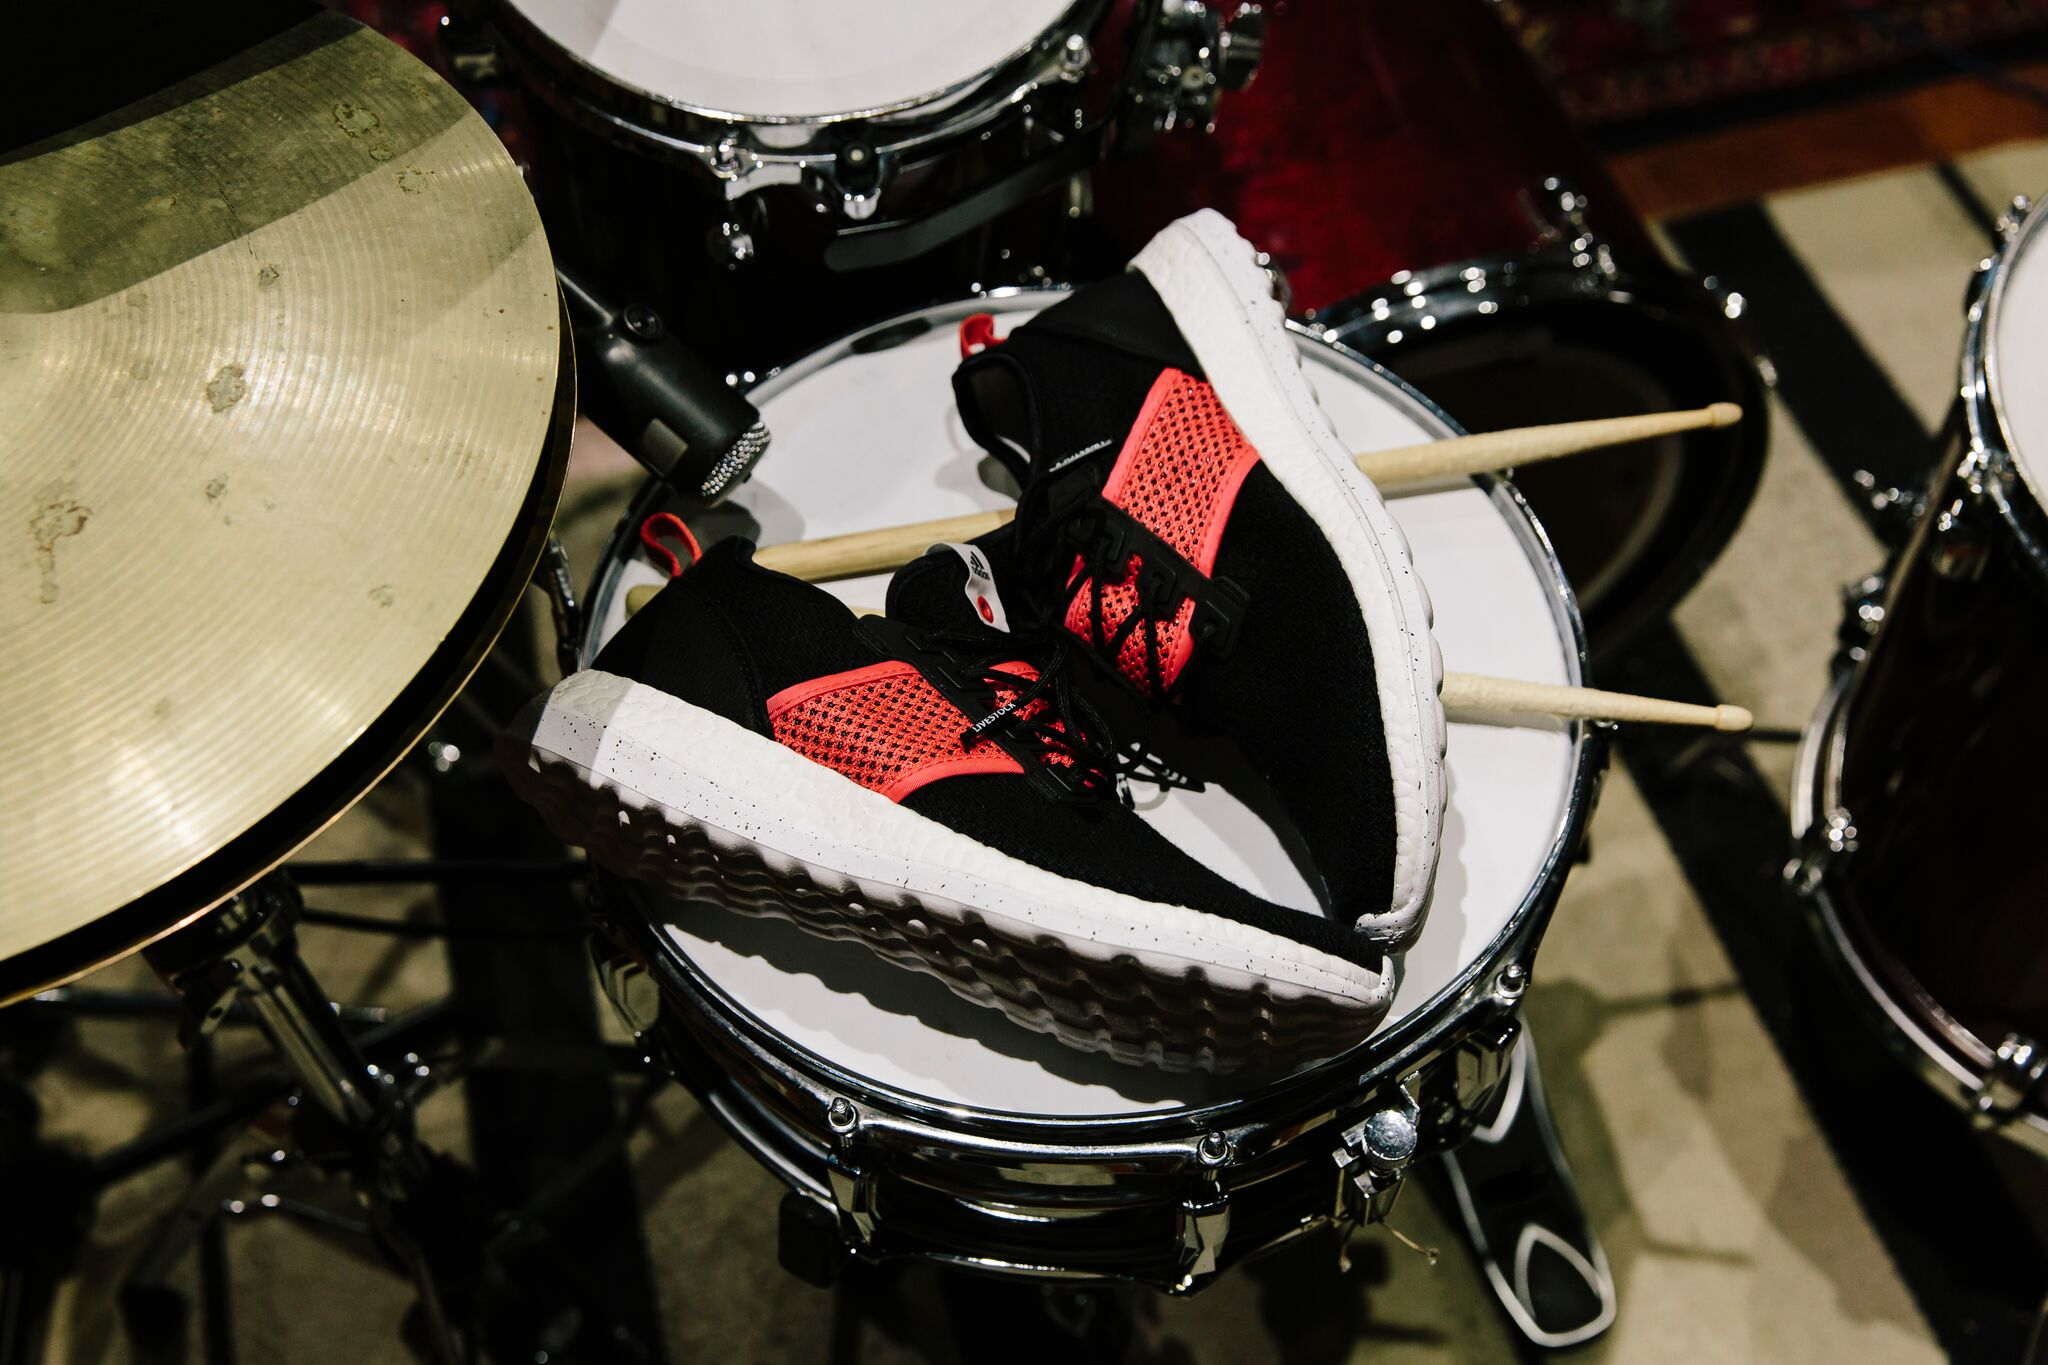 Livestock x adidas Consortium PureBOOST PK ZG Drums